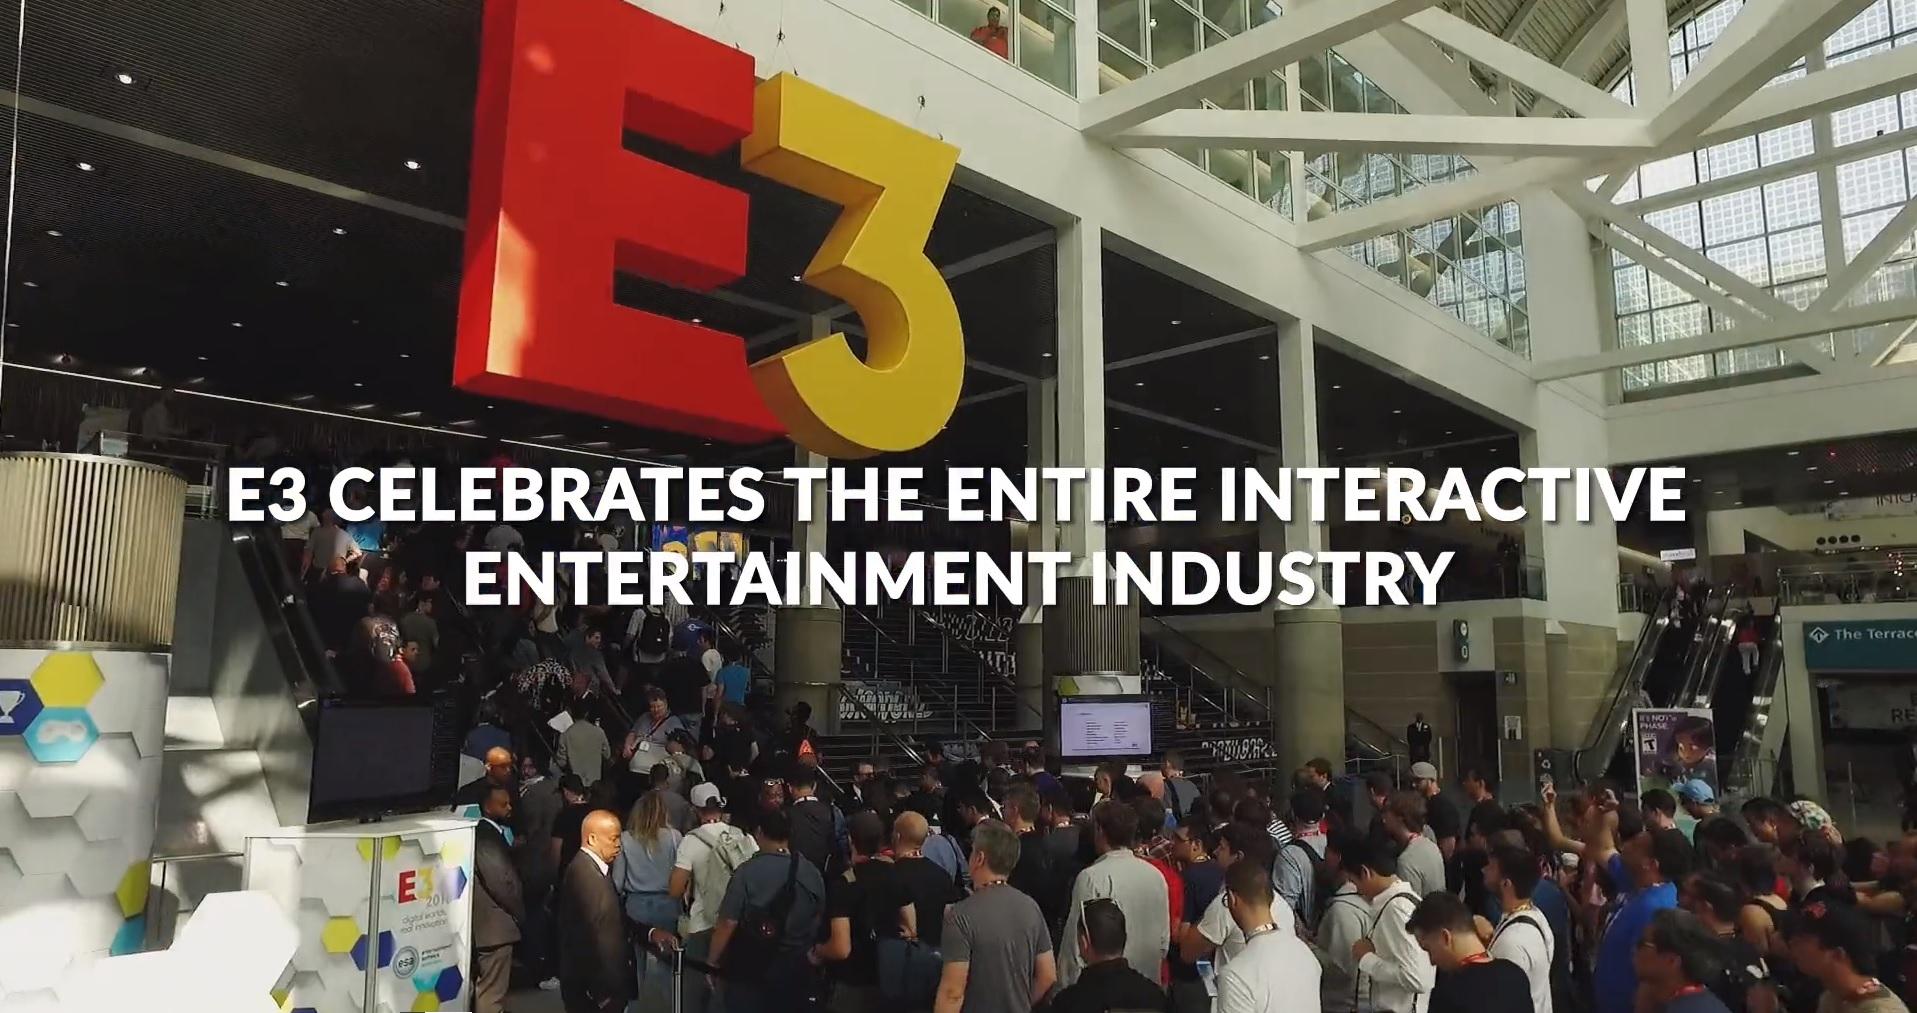 E3 2019 title